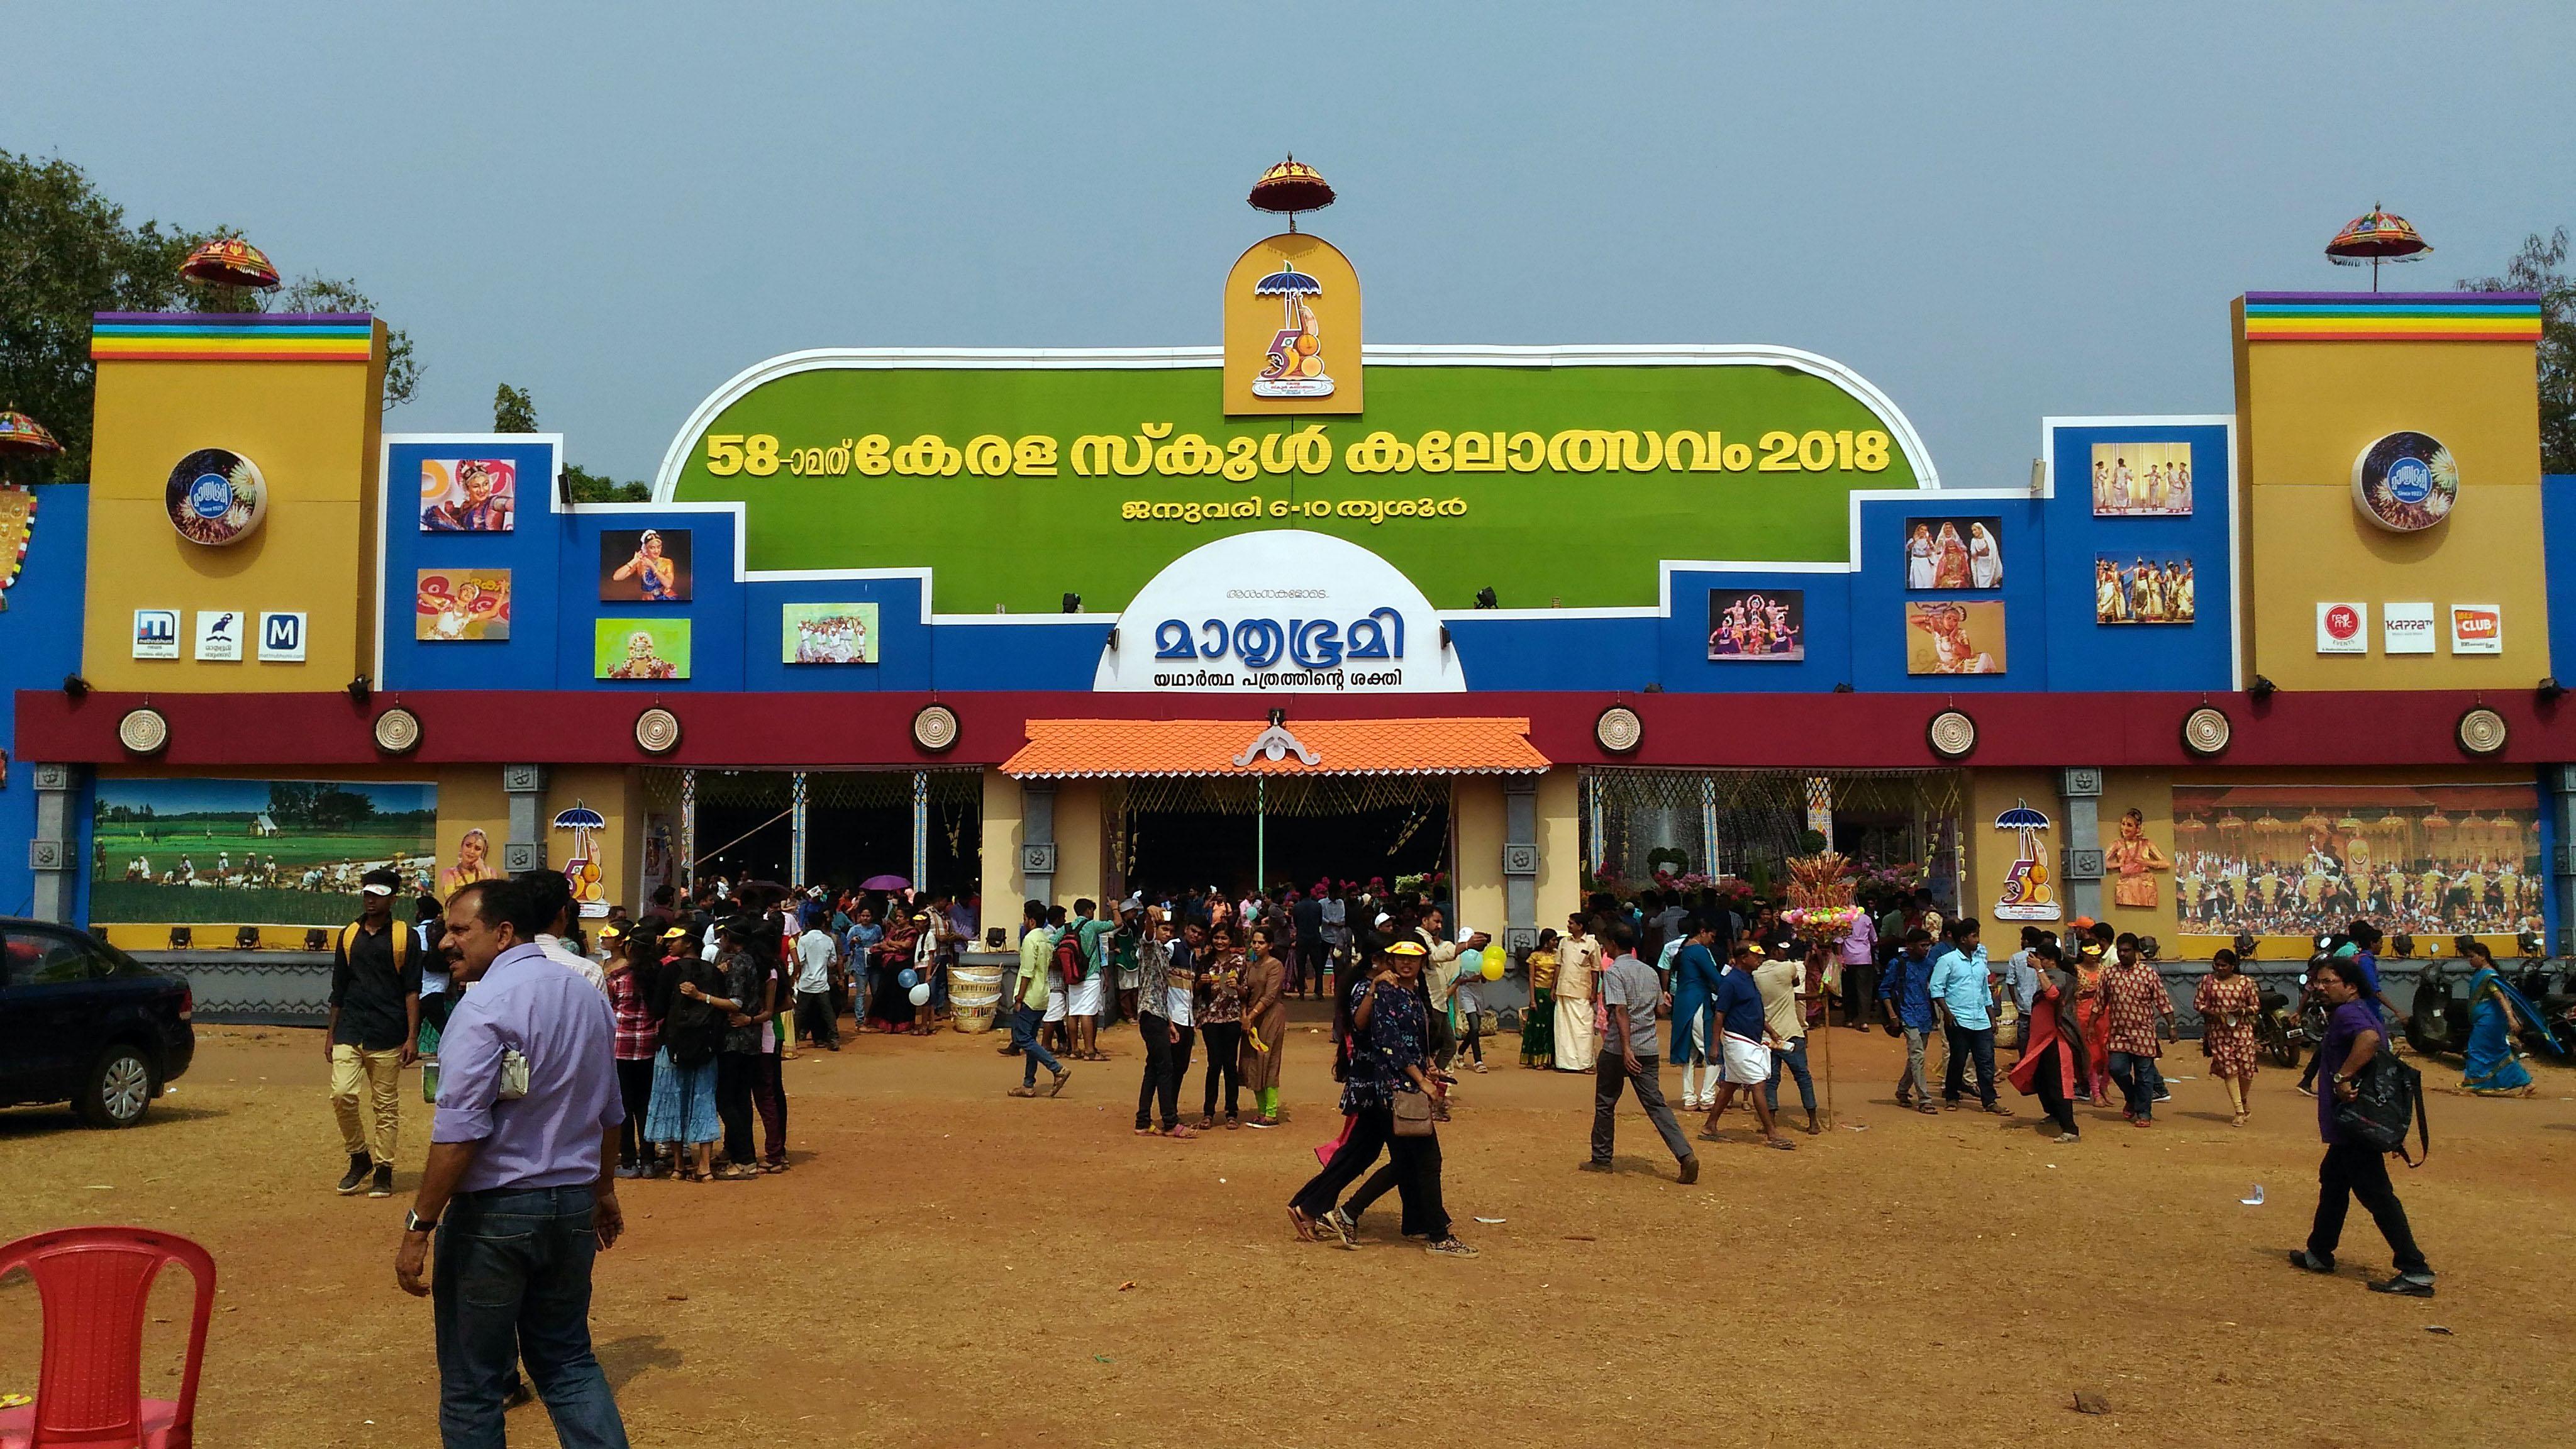 Kerala school kalolsavam 2018 Thrissur main stage long view image